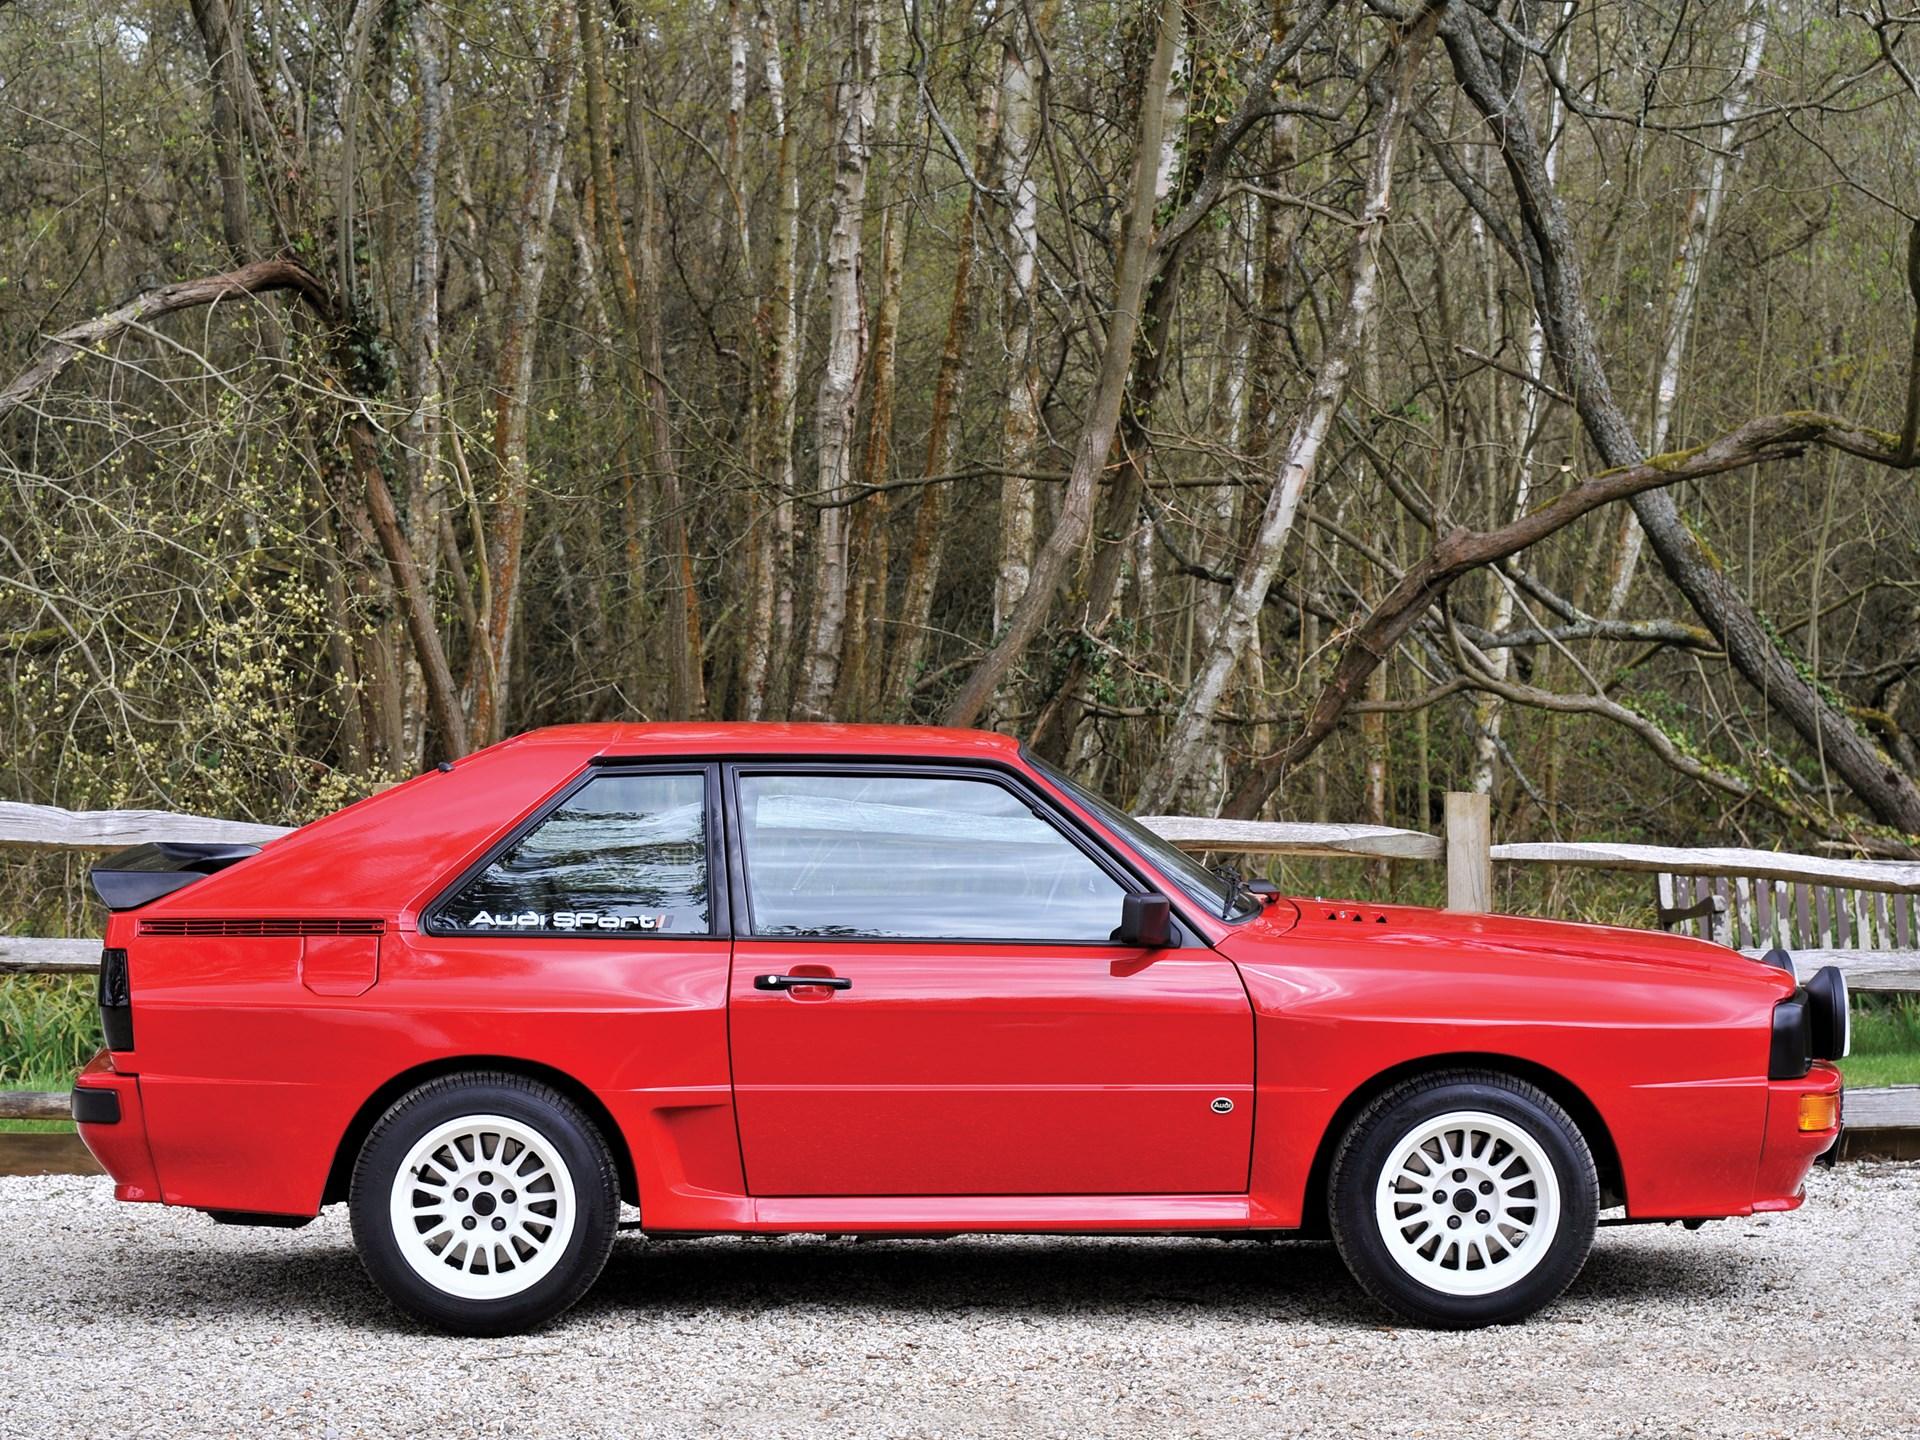 Audi Sport Quattro >> Rm Sotheby S 1986 Audi Sport Quattro London 2016